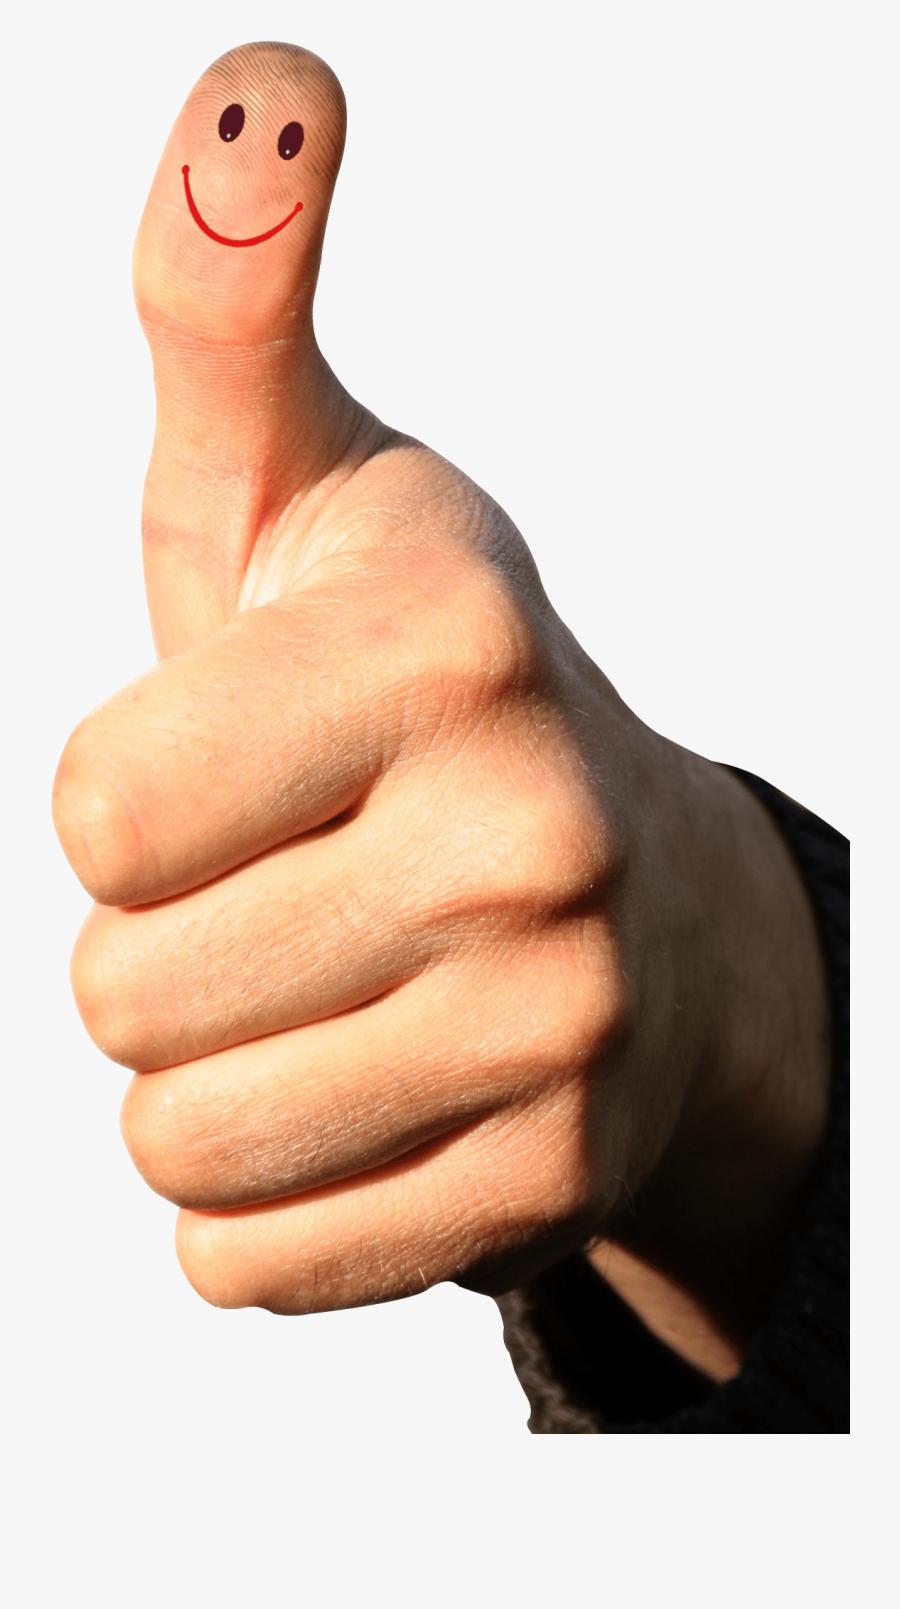 Transparent Png Man Arms Up - Transparent Background Thumbs Up Png, Transparent Clipart